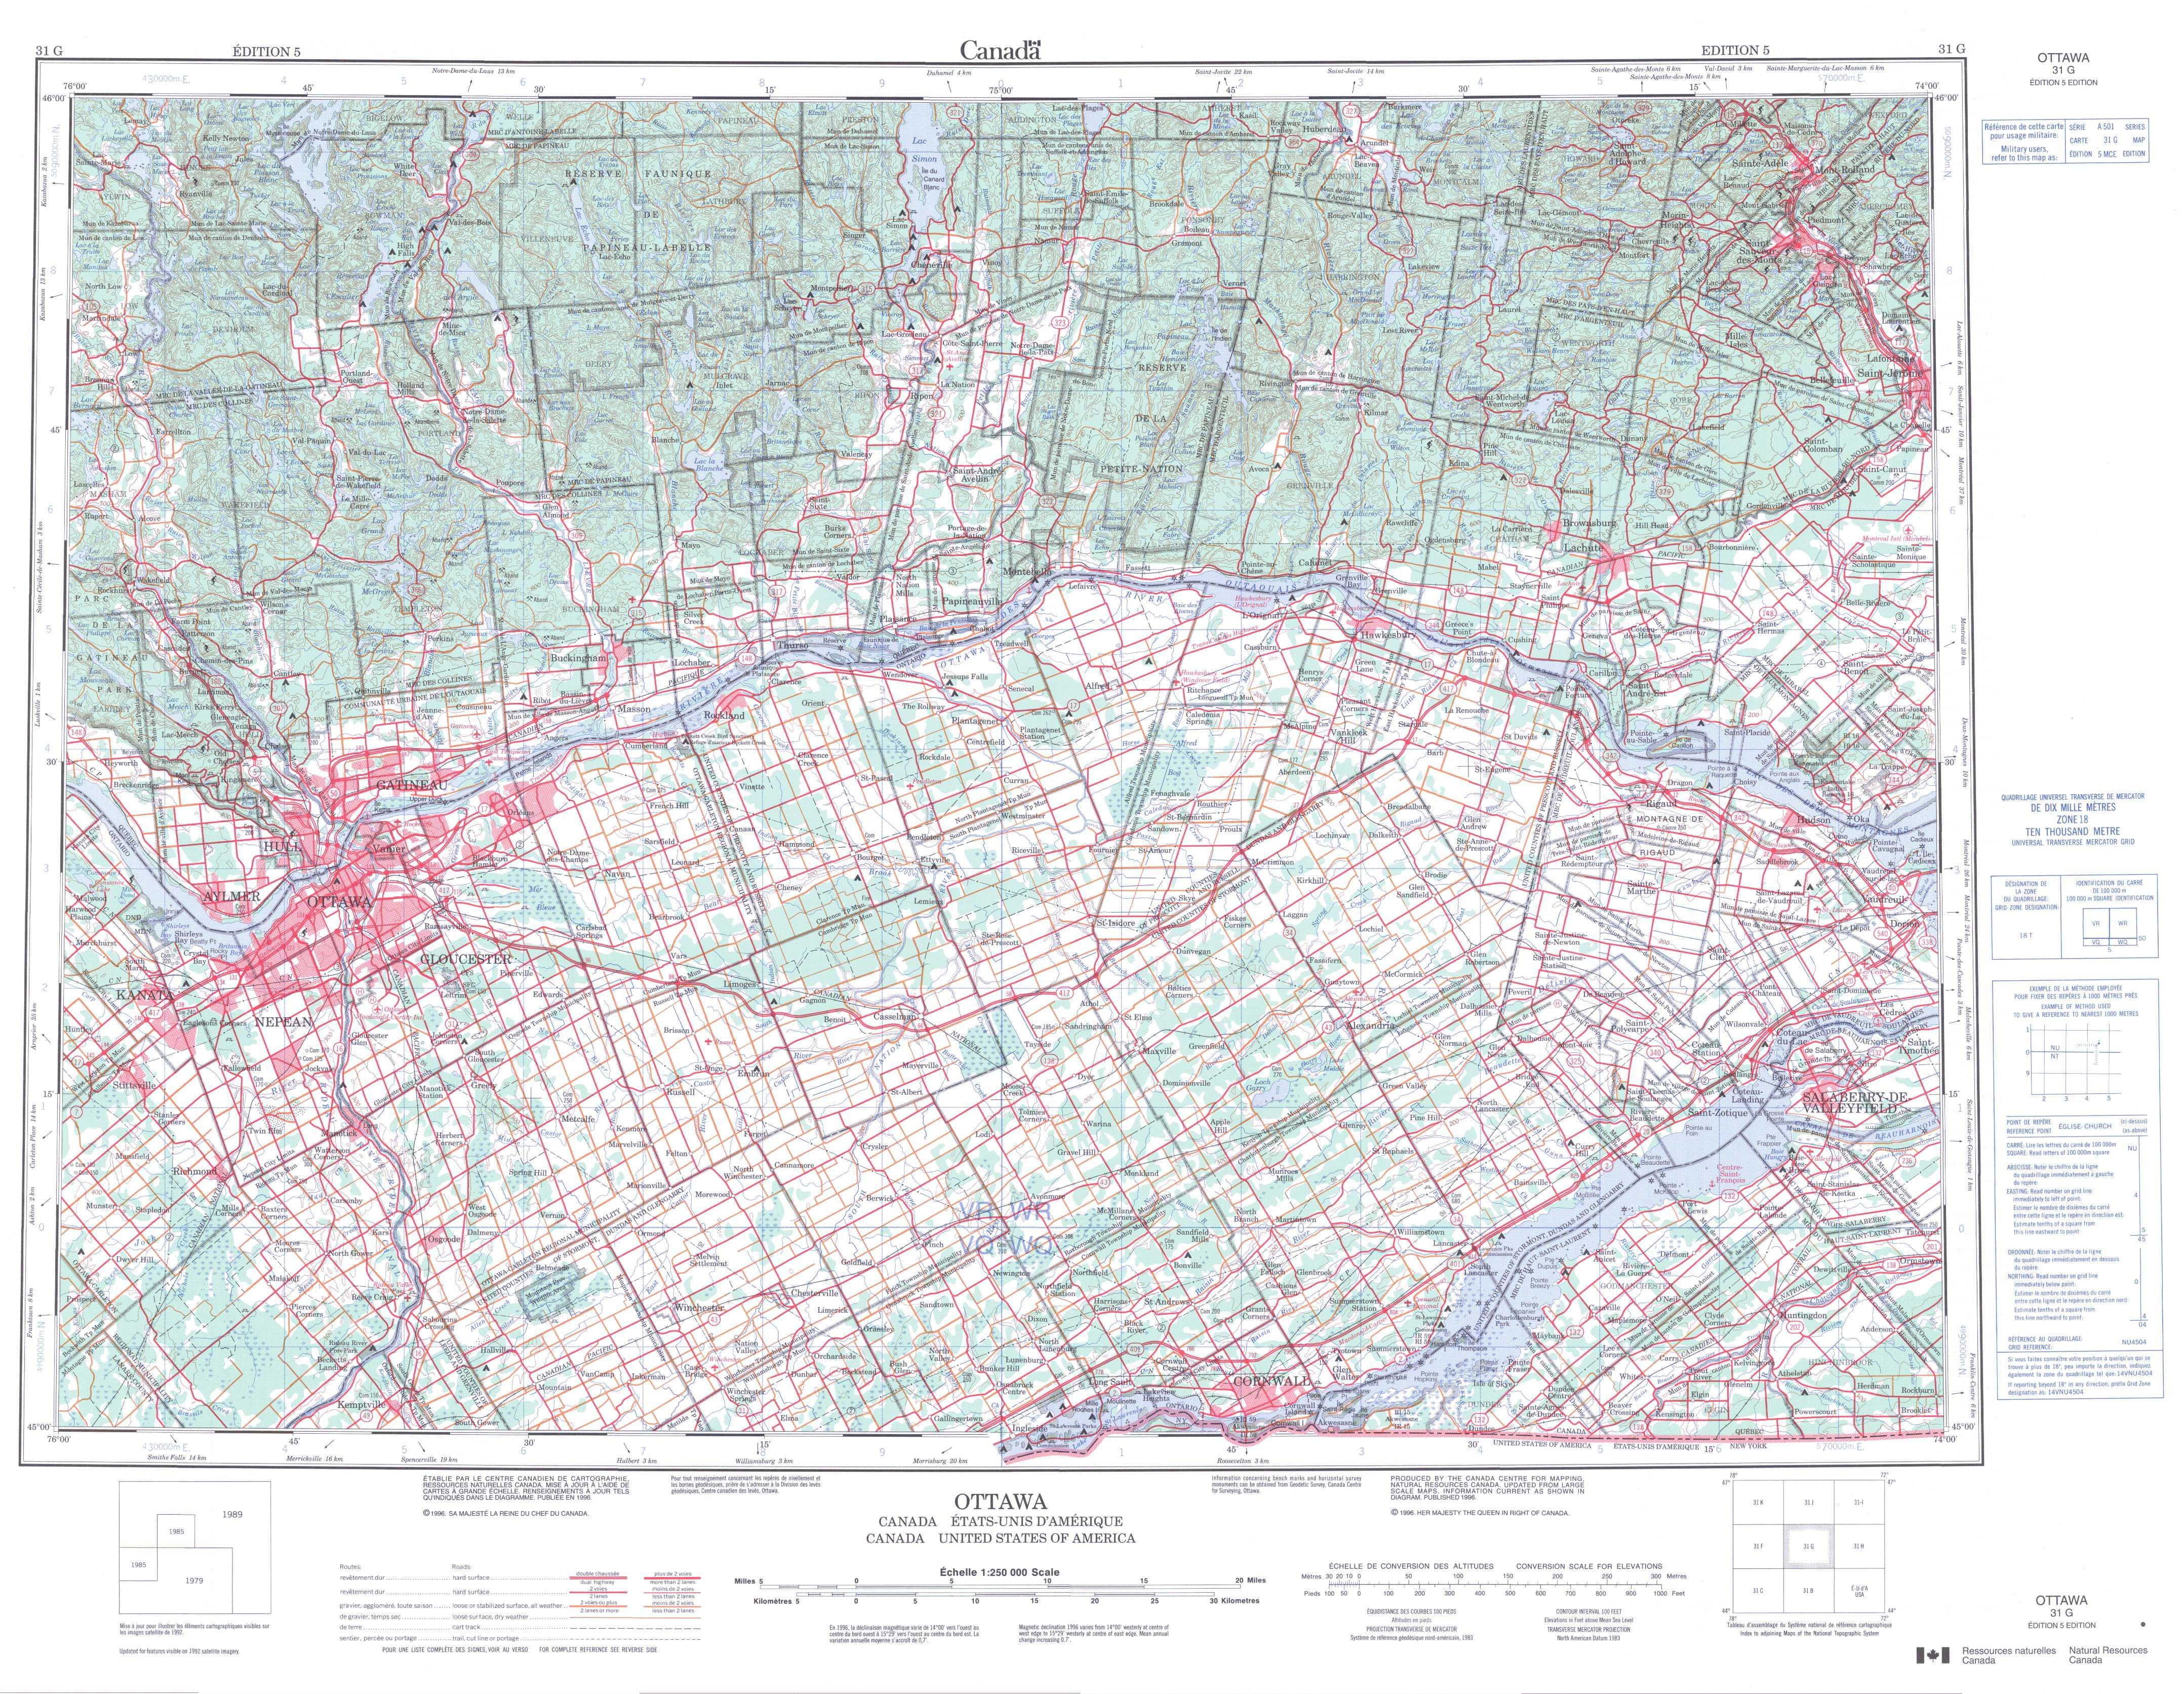 Printable Topographic Map Of Ottawa 031G, On - Printable Topo Maps